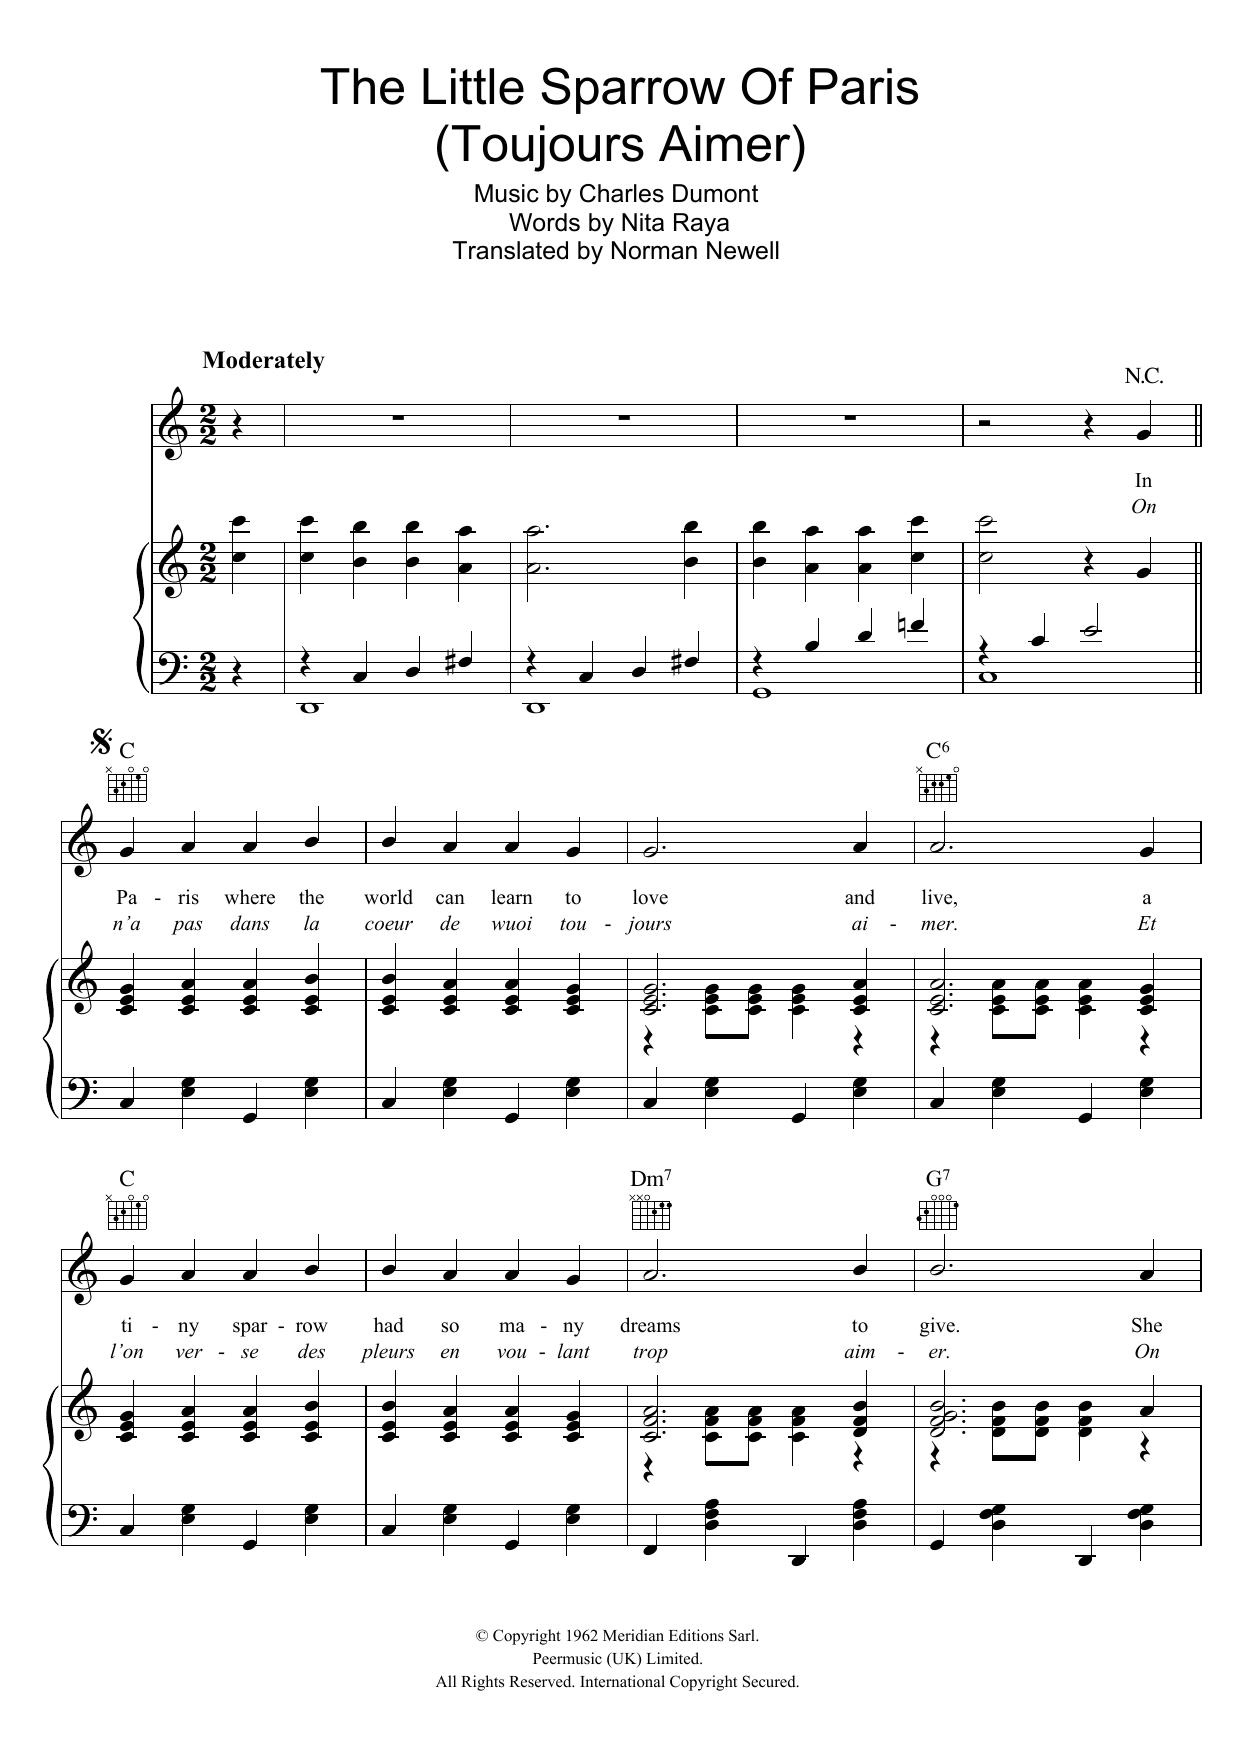 The Little Sparrow Of Paris (Toujours Aimer) (Piano, Vocal & Guitar)